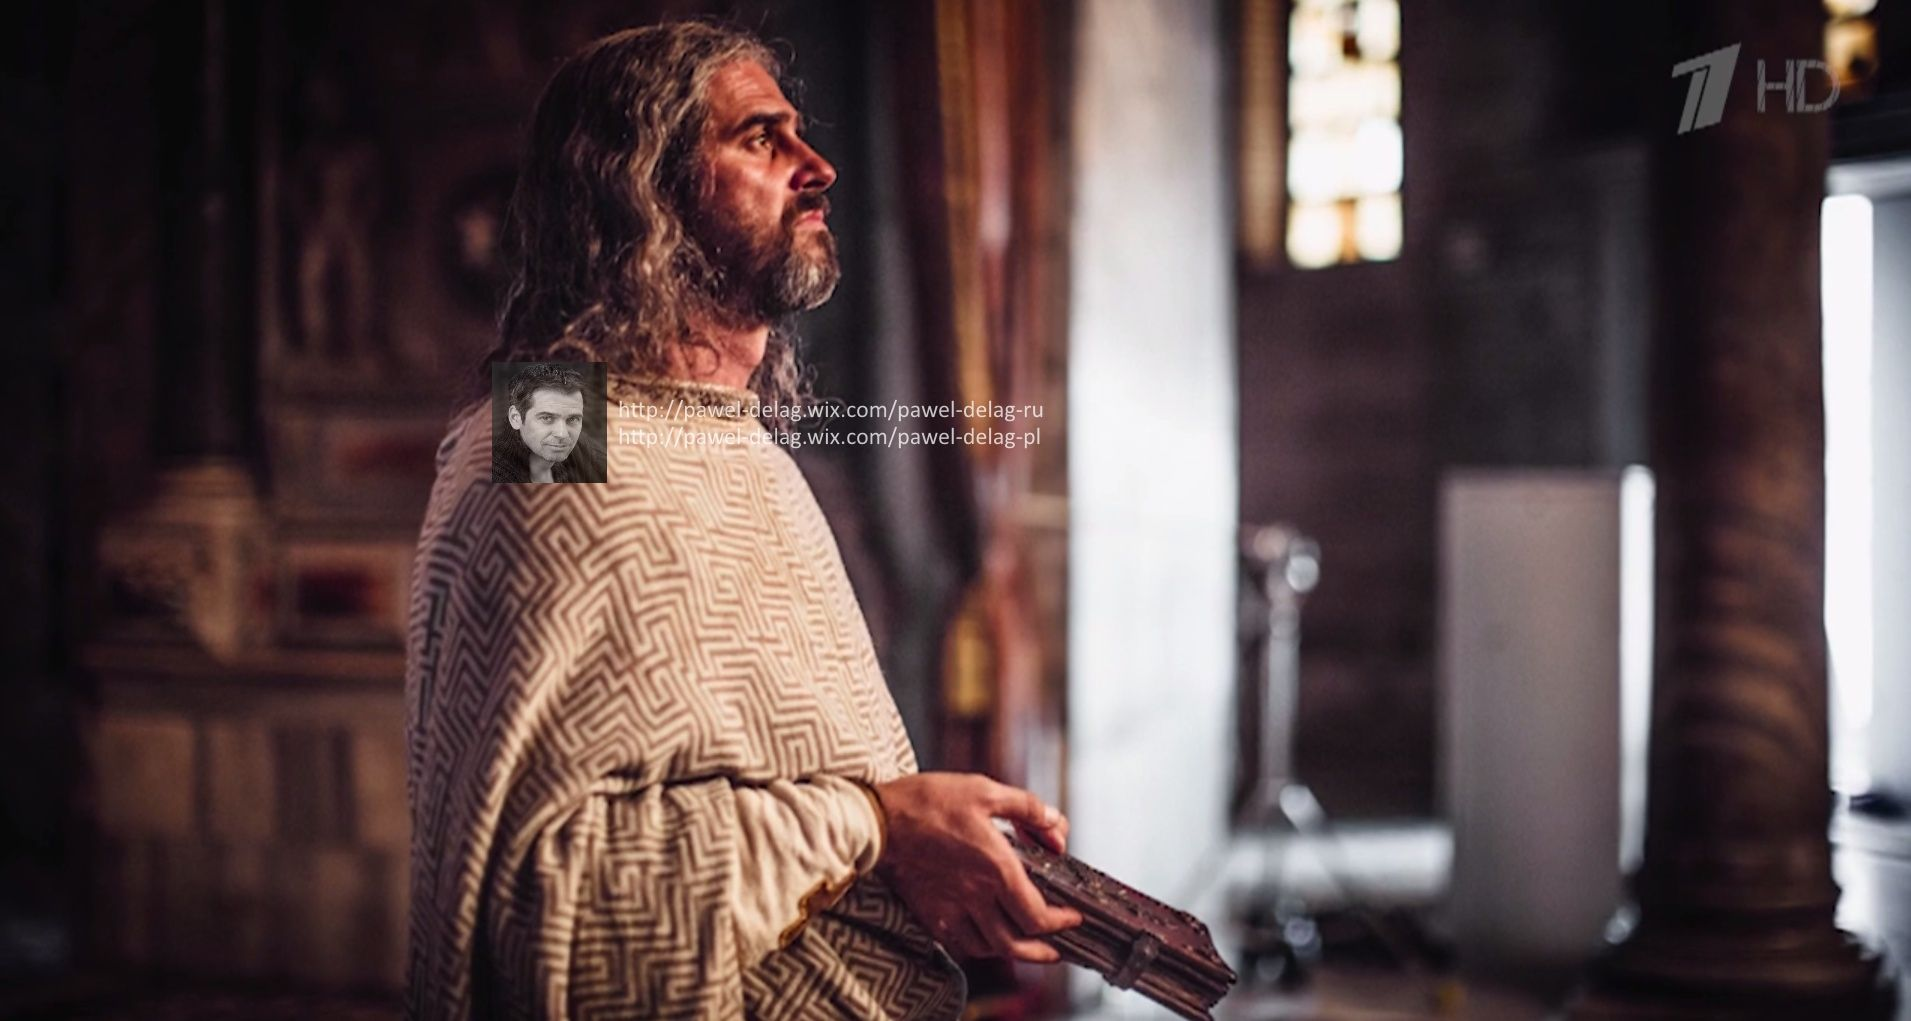 Картинки князя владимира из кино викинг крещение руси